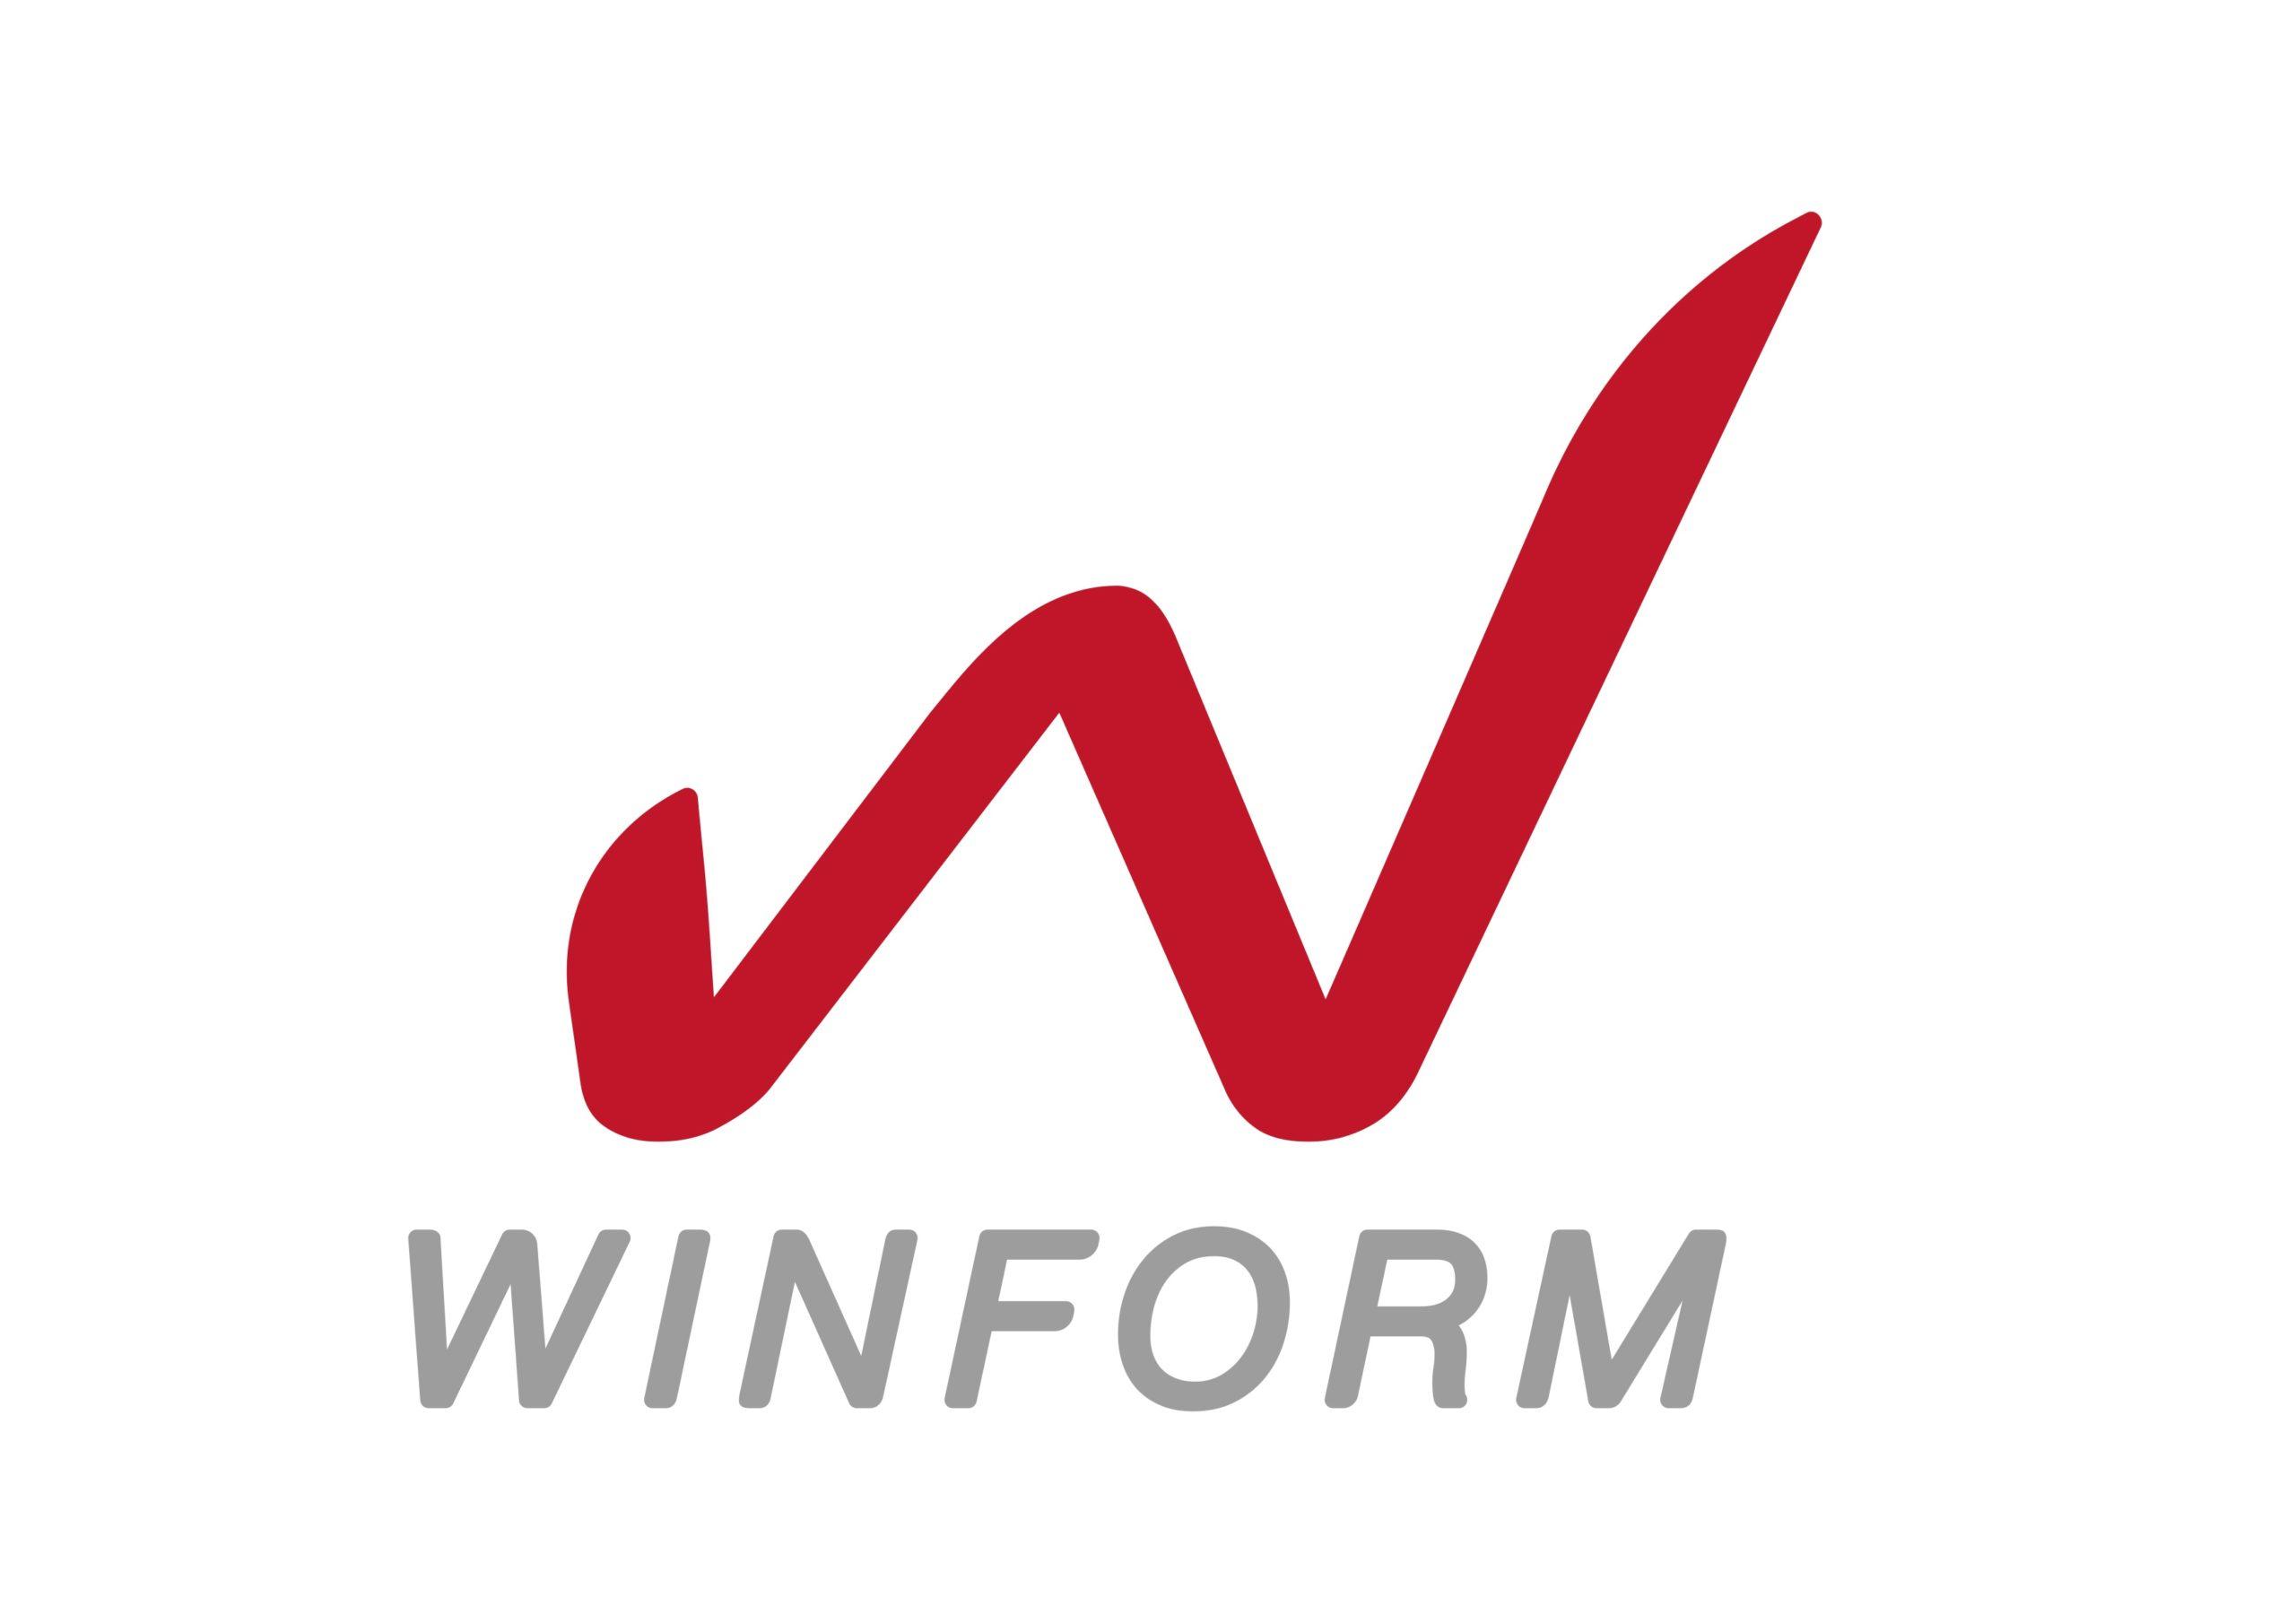 winform logo